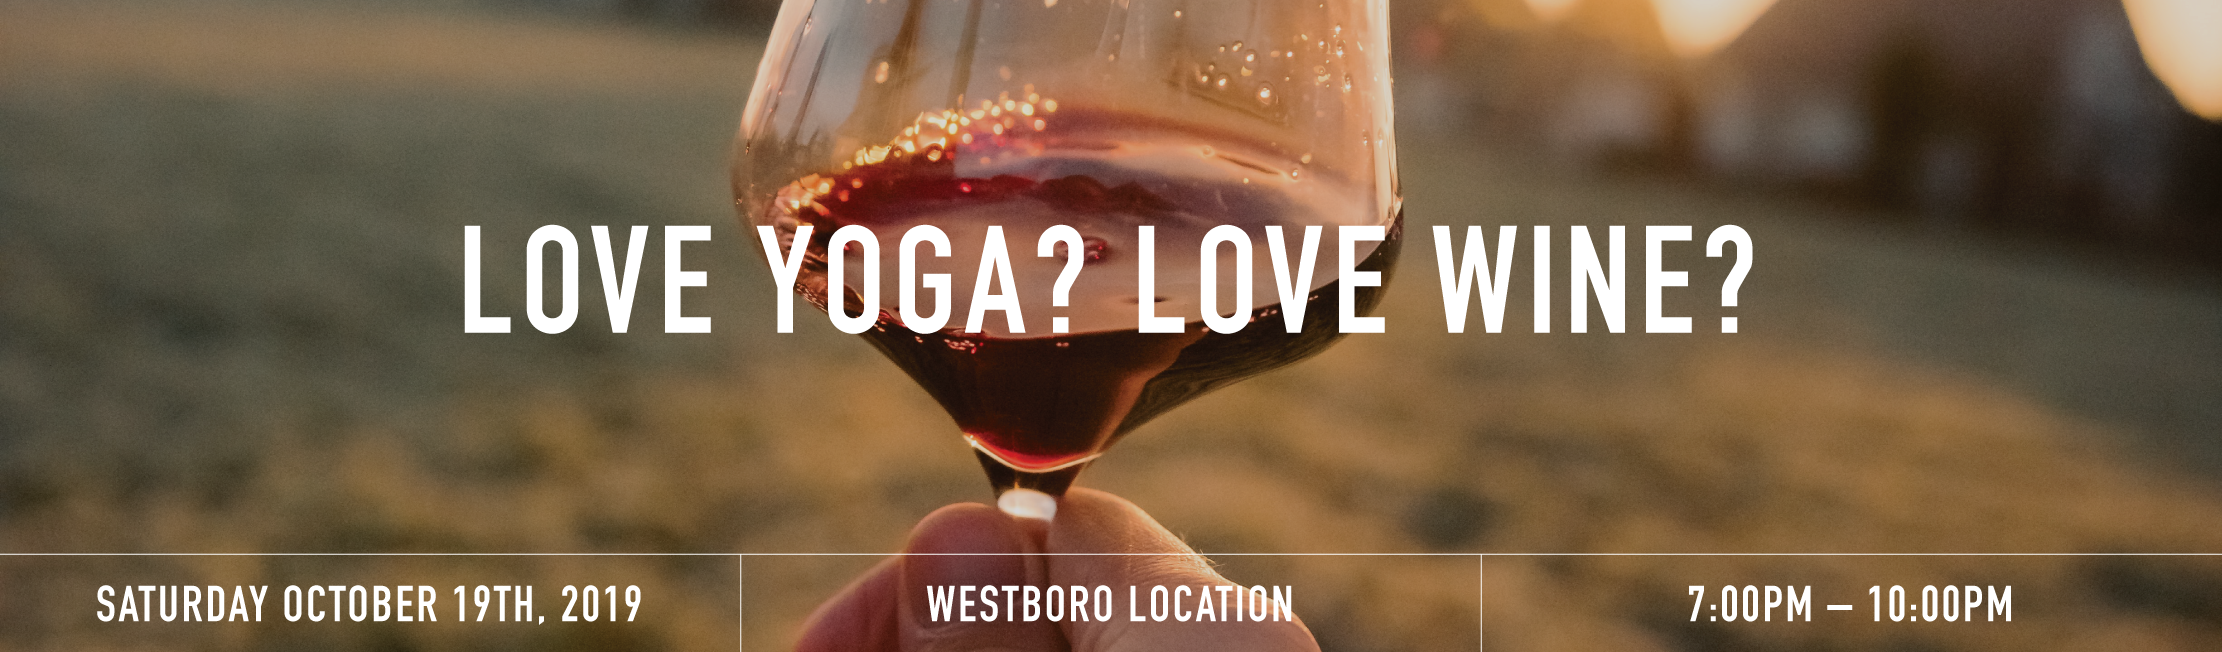 Wine yoga banner